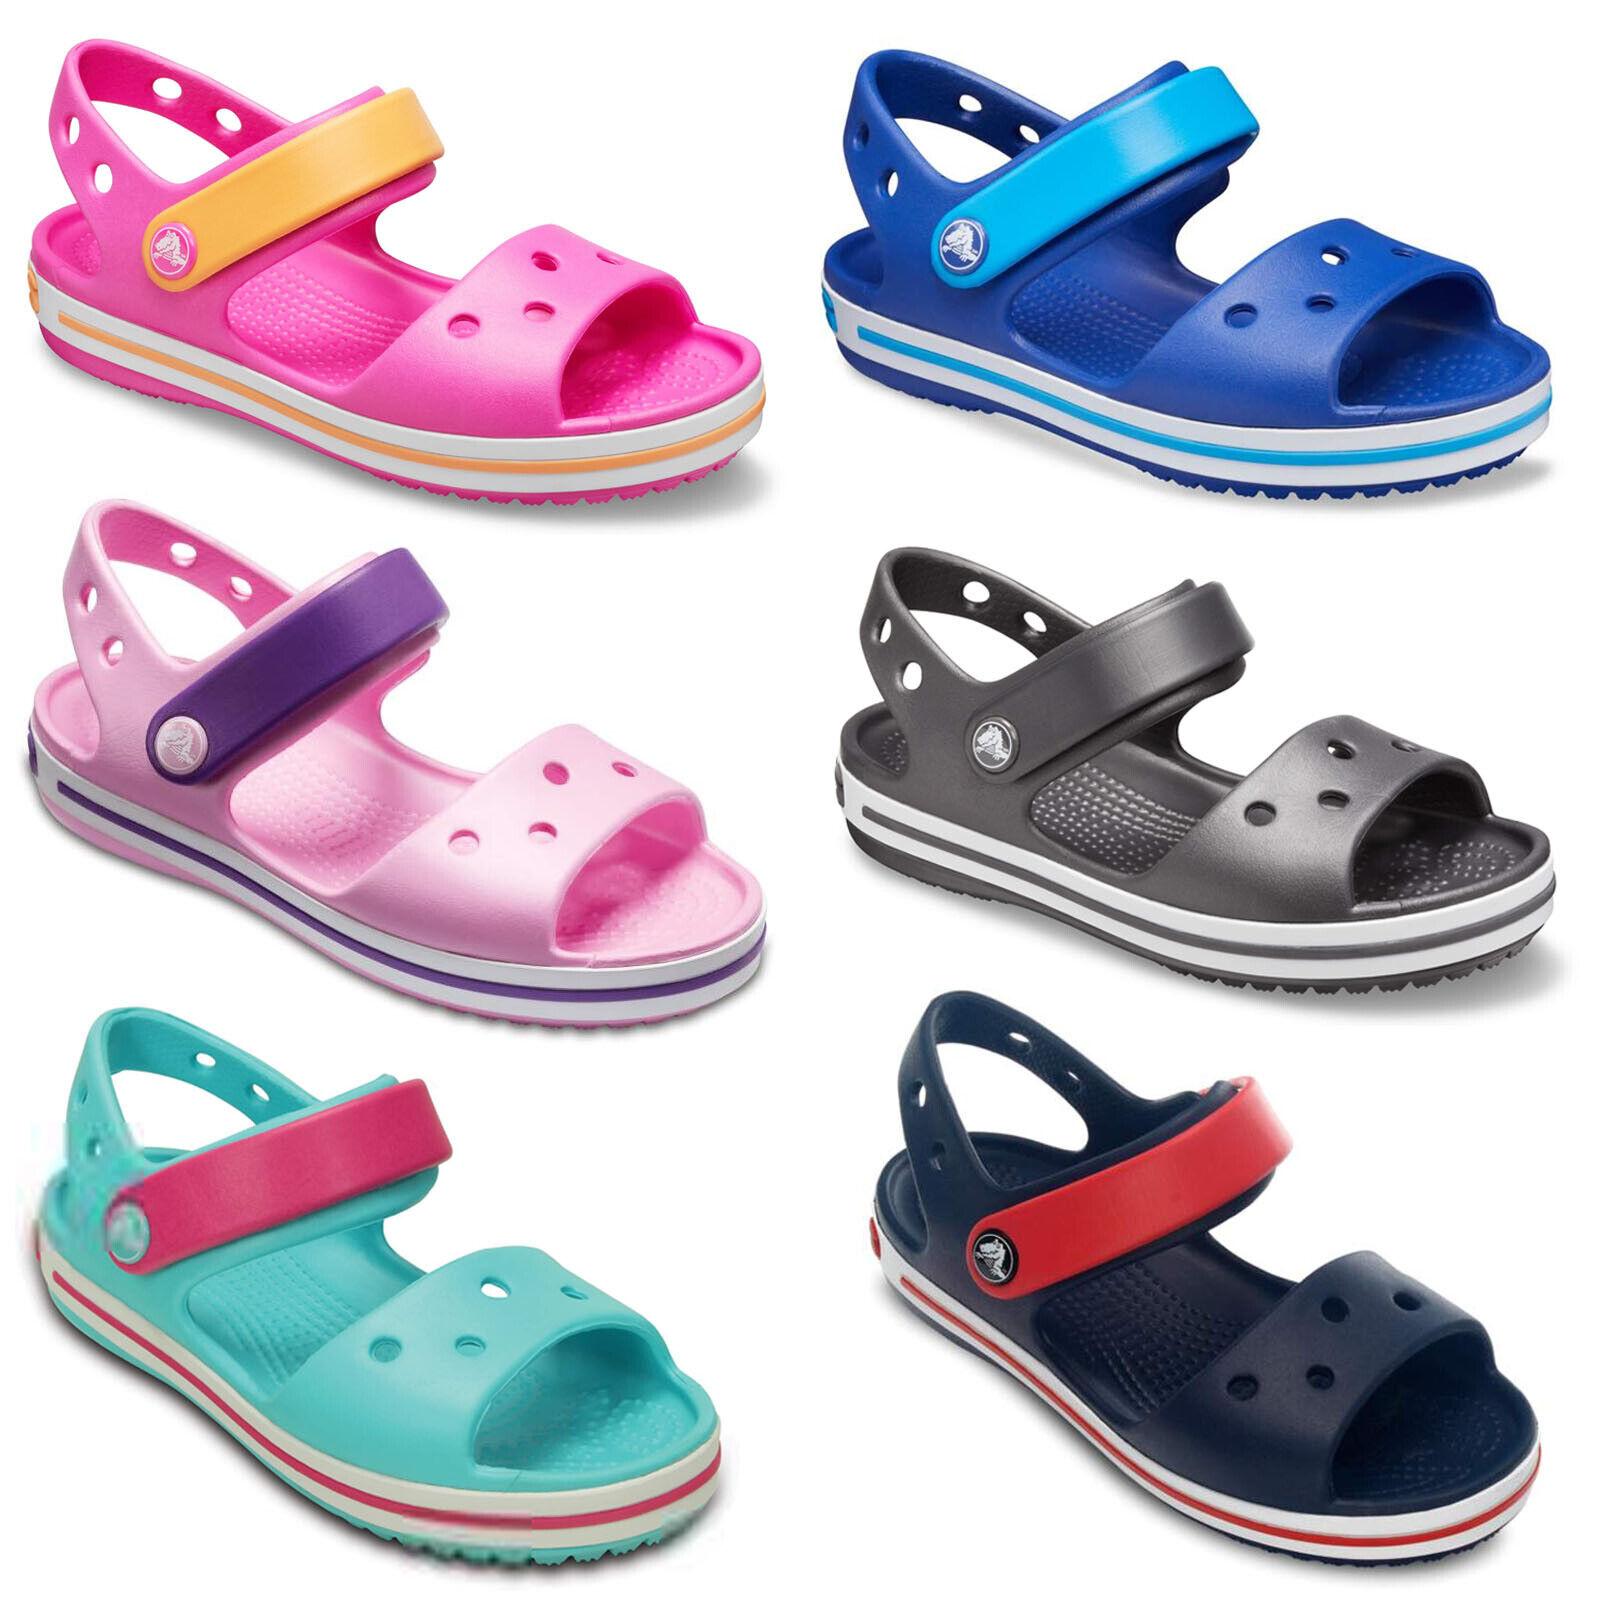 Crocs Crocband Sandals Kids Children